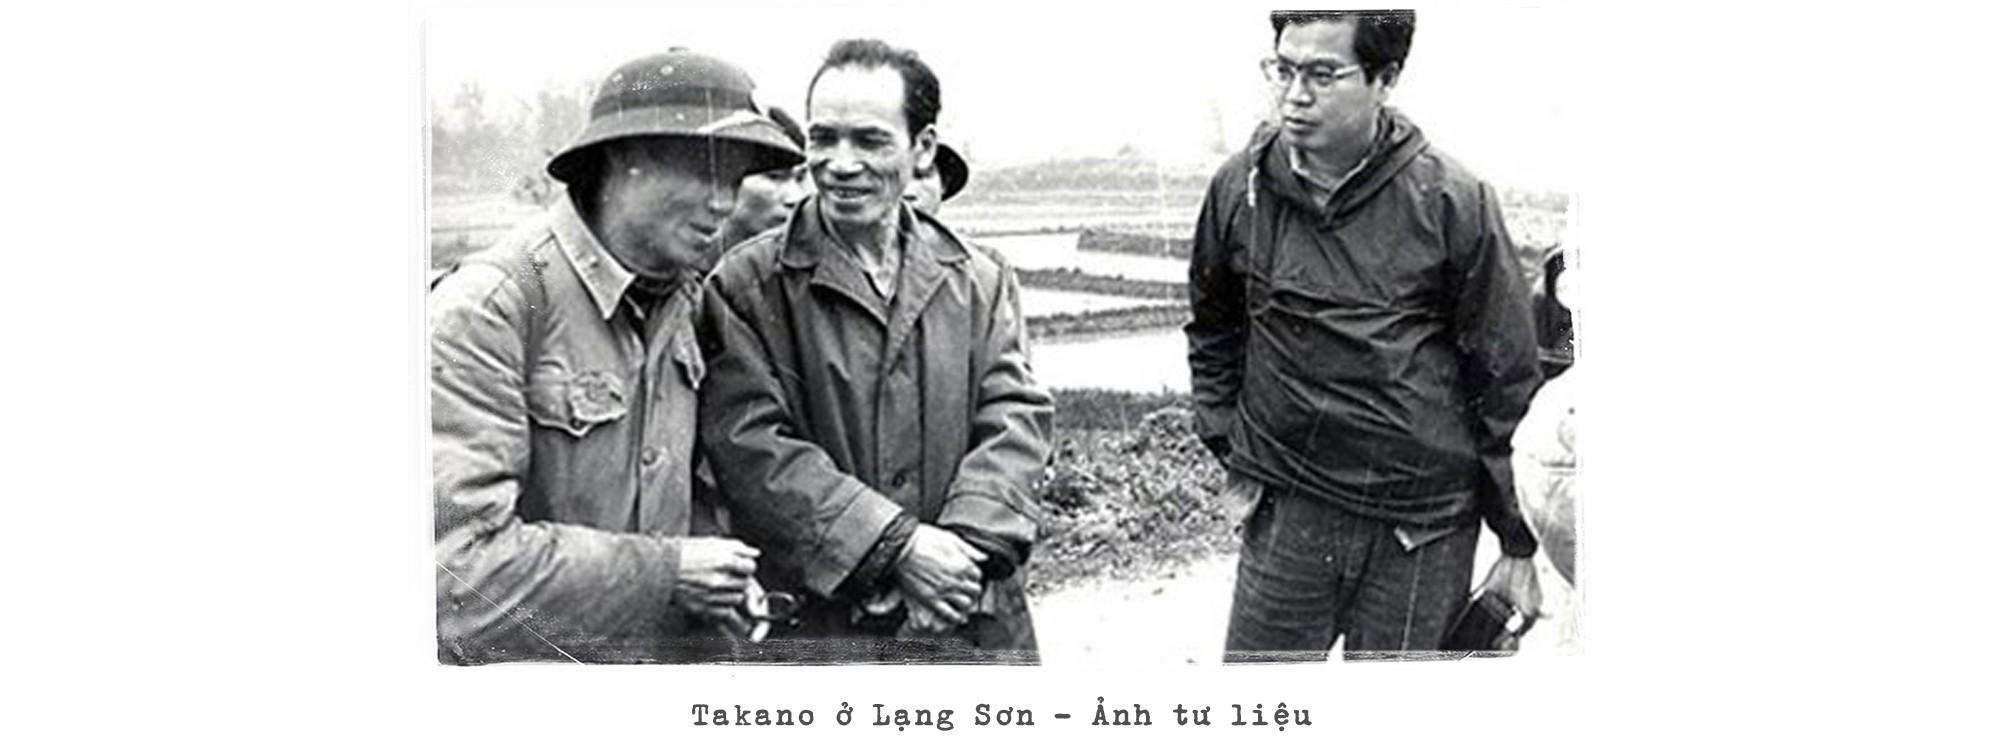 Kỳ 3: Cái chết của Takano - Ảnh 4.